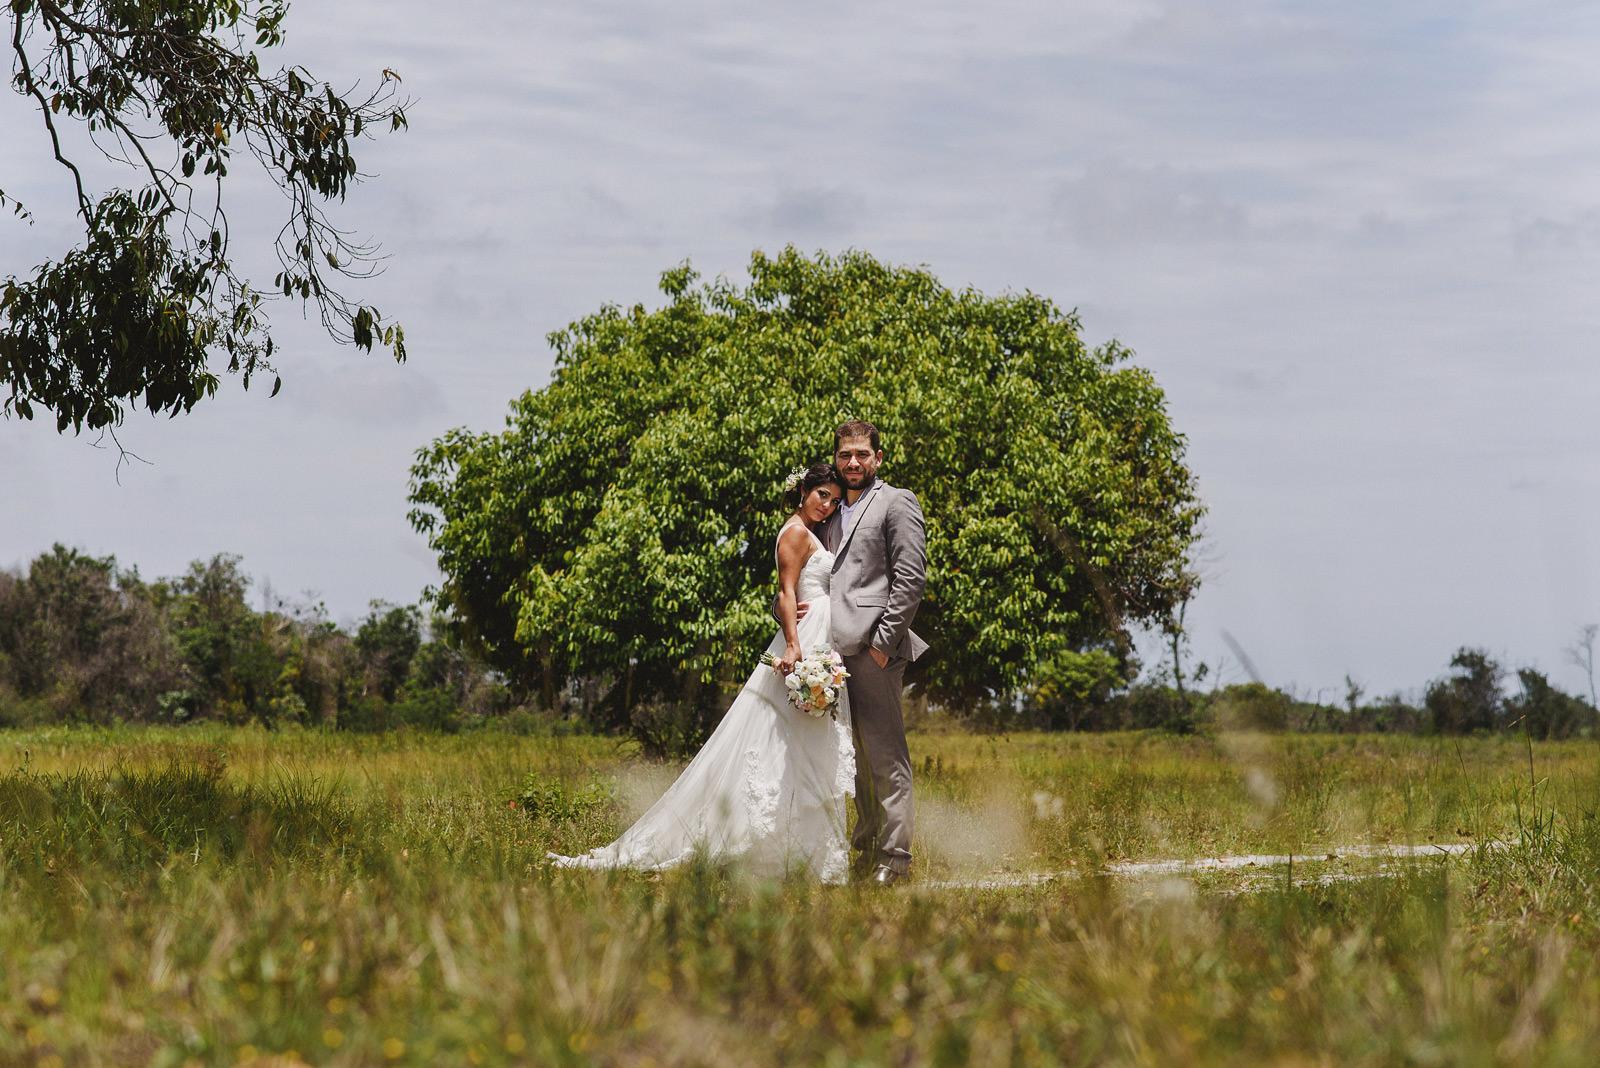 casamento rj meio do mato